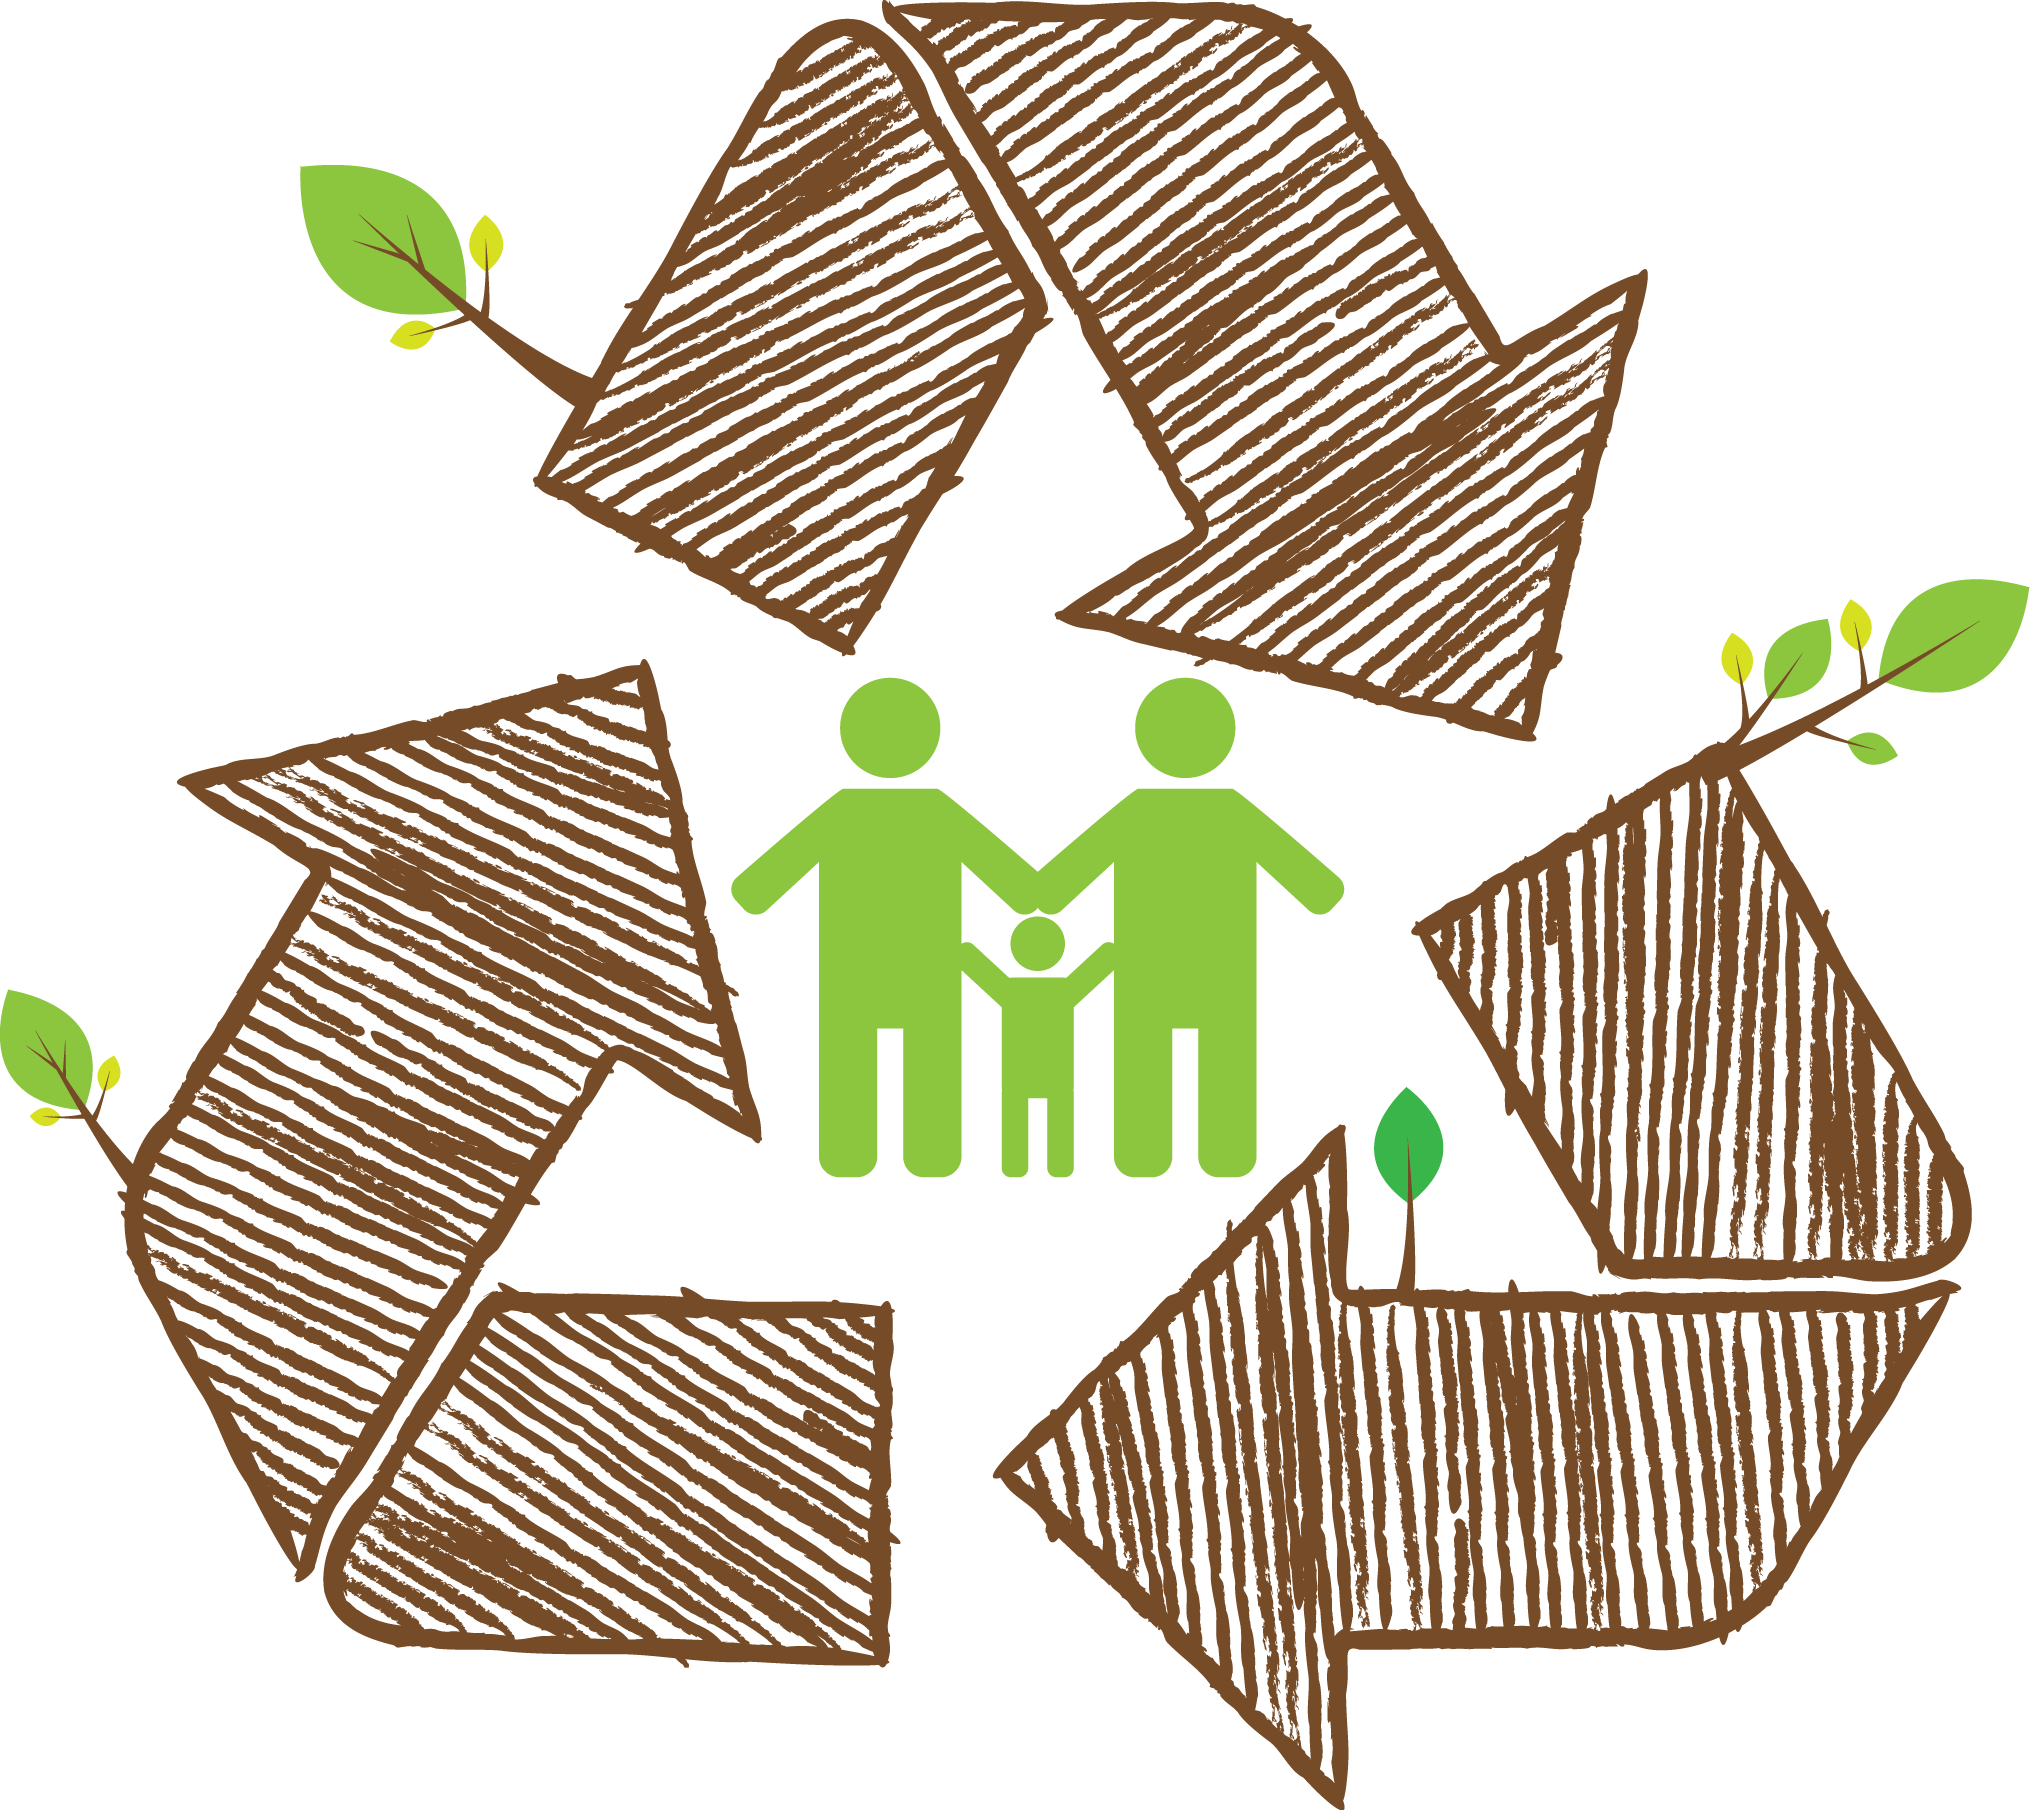 Recicla hogar reciclahogar twitter - Reciclar cosas para el hogar ...